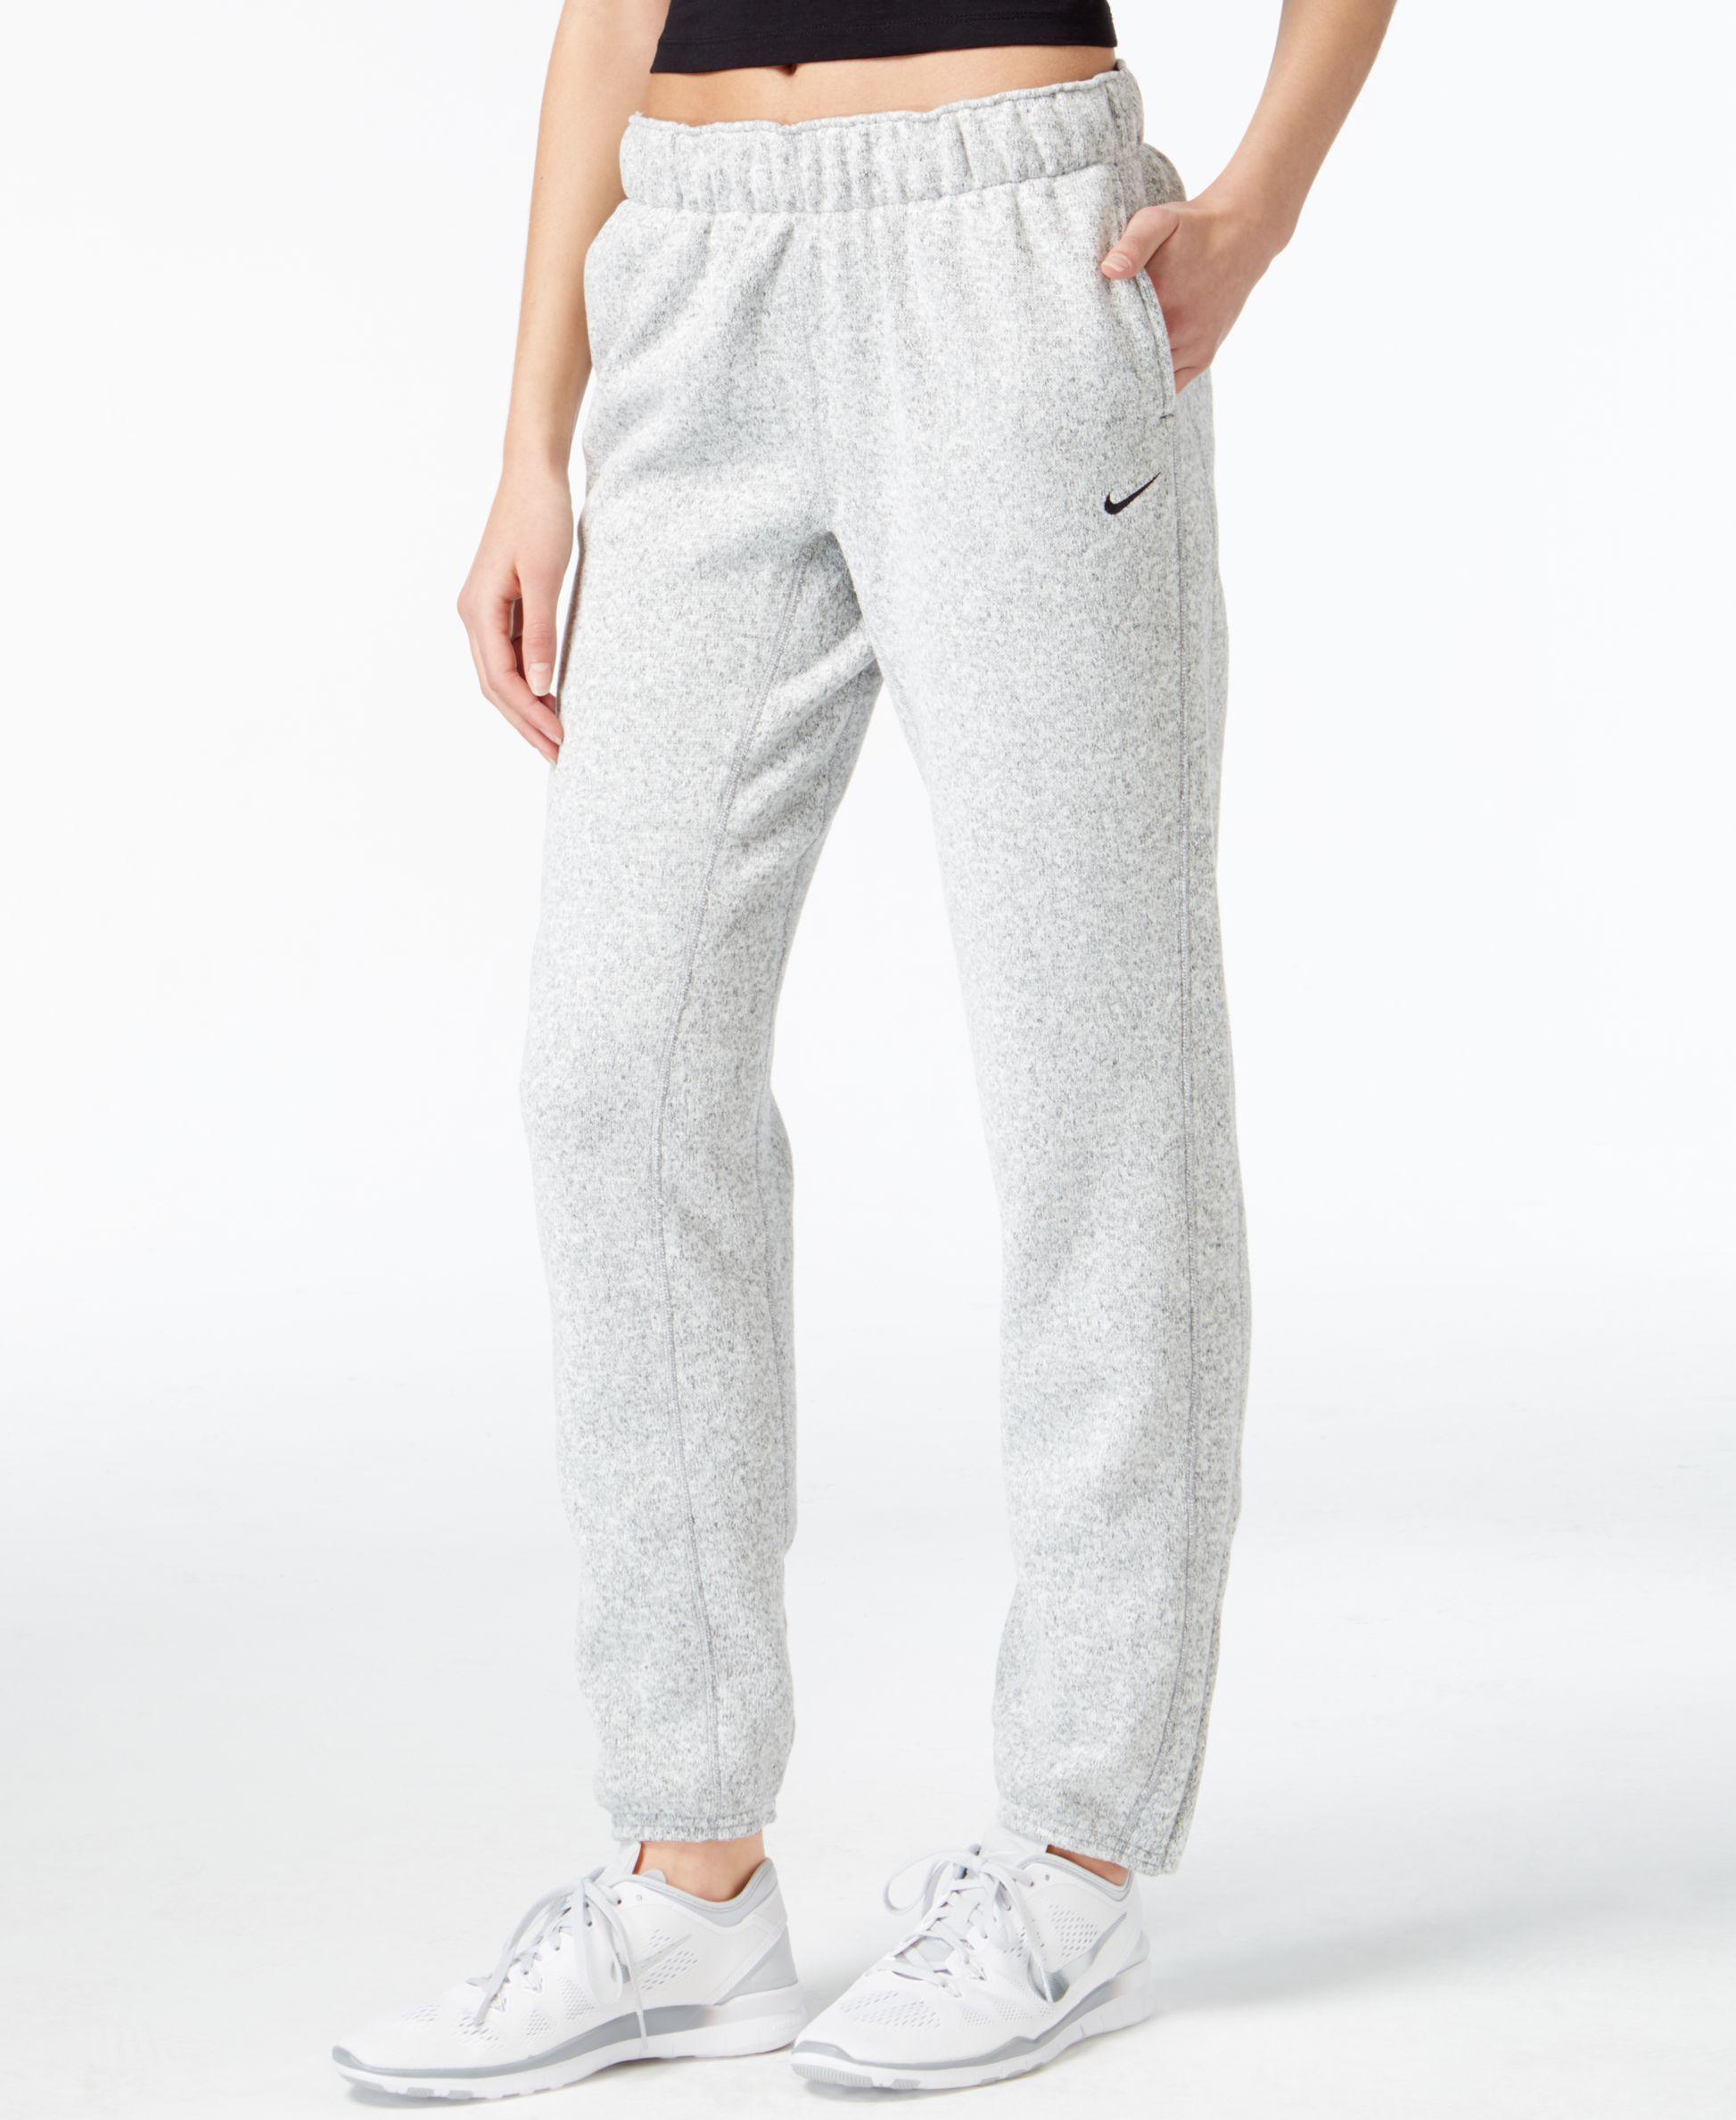 30474522635941 Nike Therma-fit Sweat Pants | Carly's Stuff in 2019 | Sweatpants ...